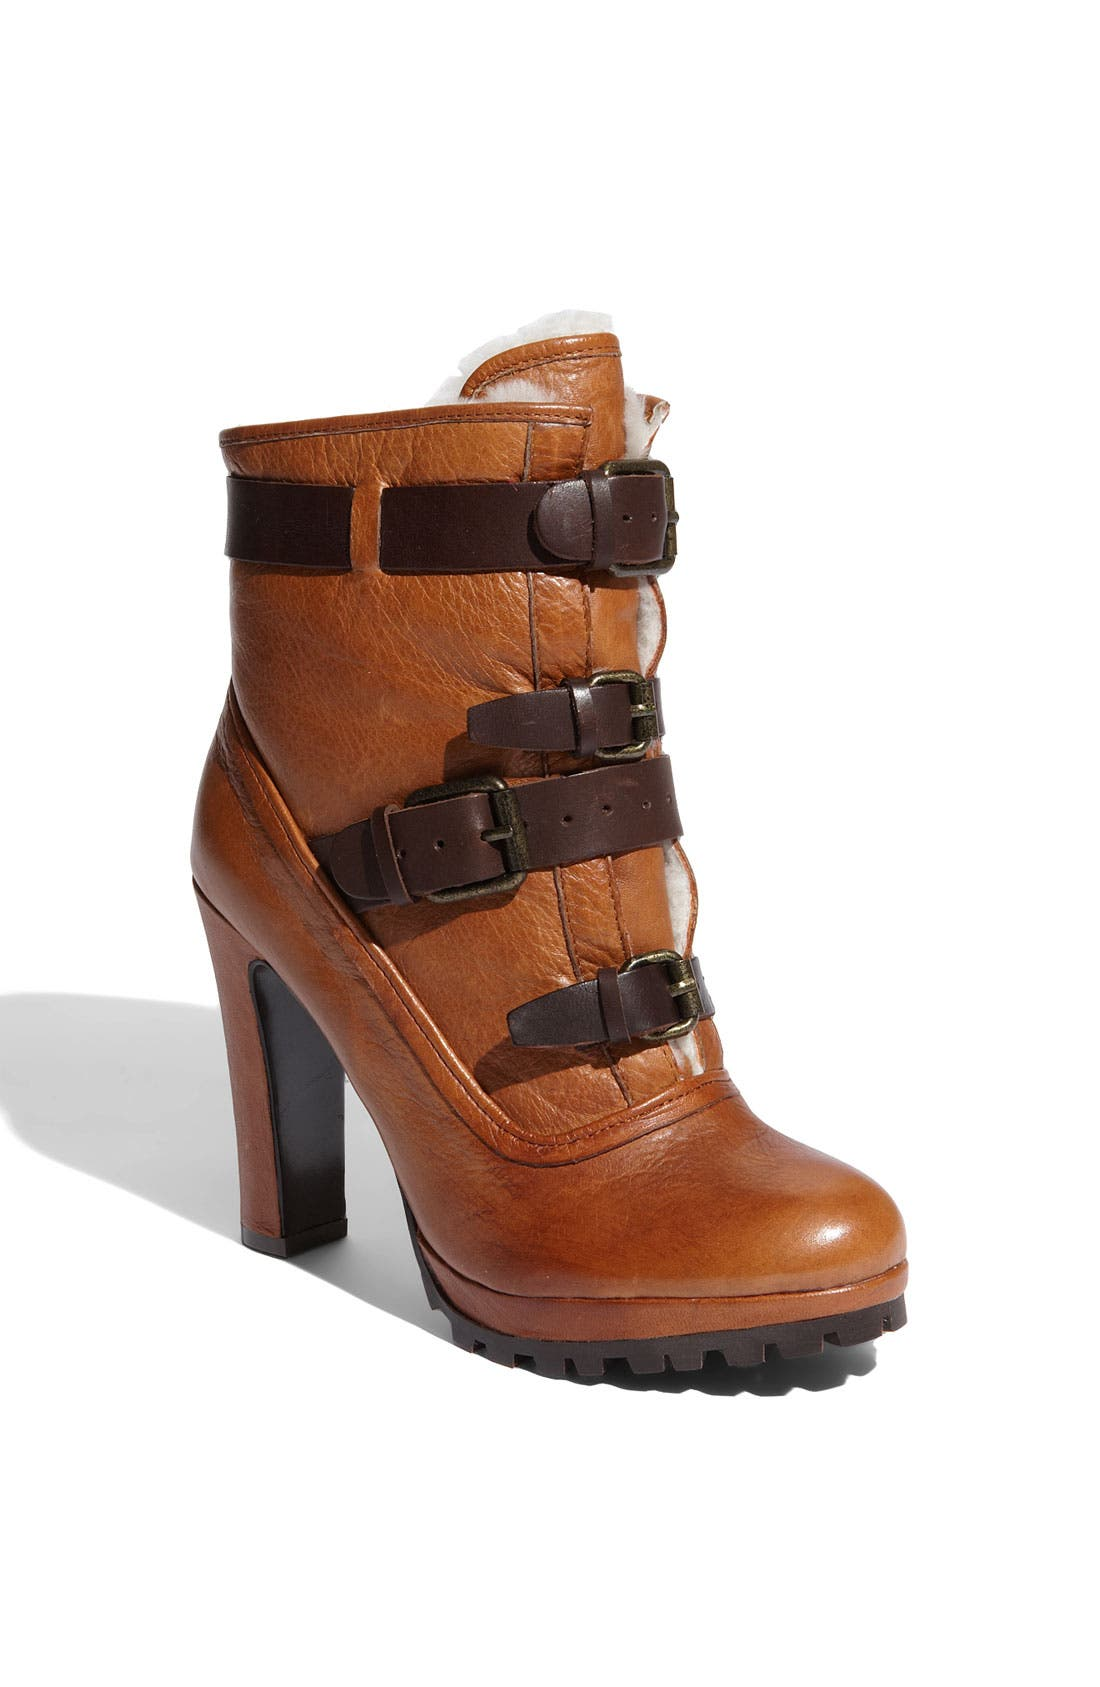 Alternate Image 1 Selected - Dolce Vita 'Josh' Ankle Boot